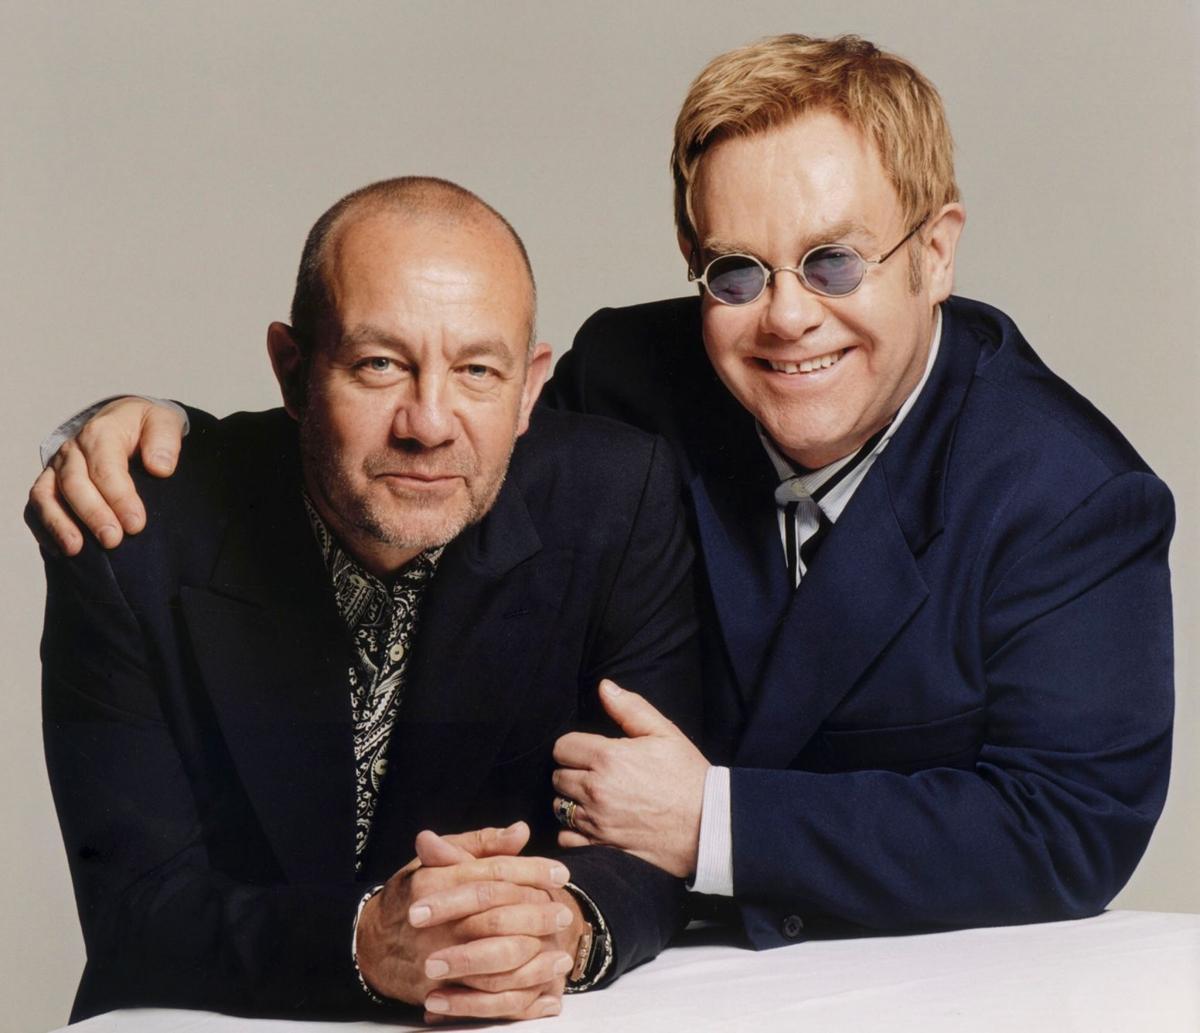 110619_MNS_Taupin_Lowe_001 Bernie Taupin Elton John